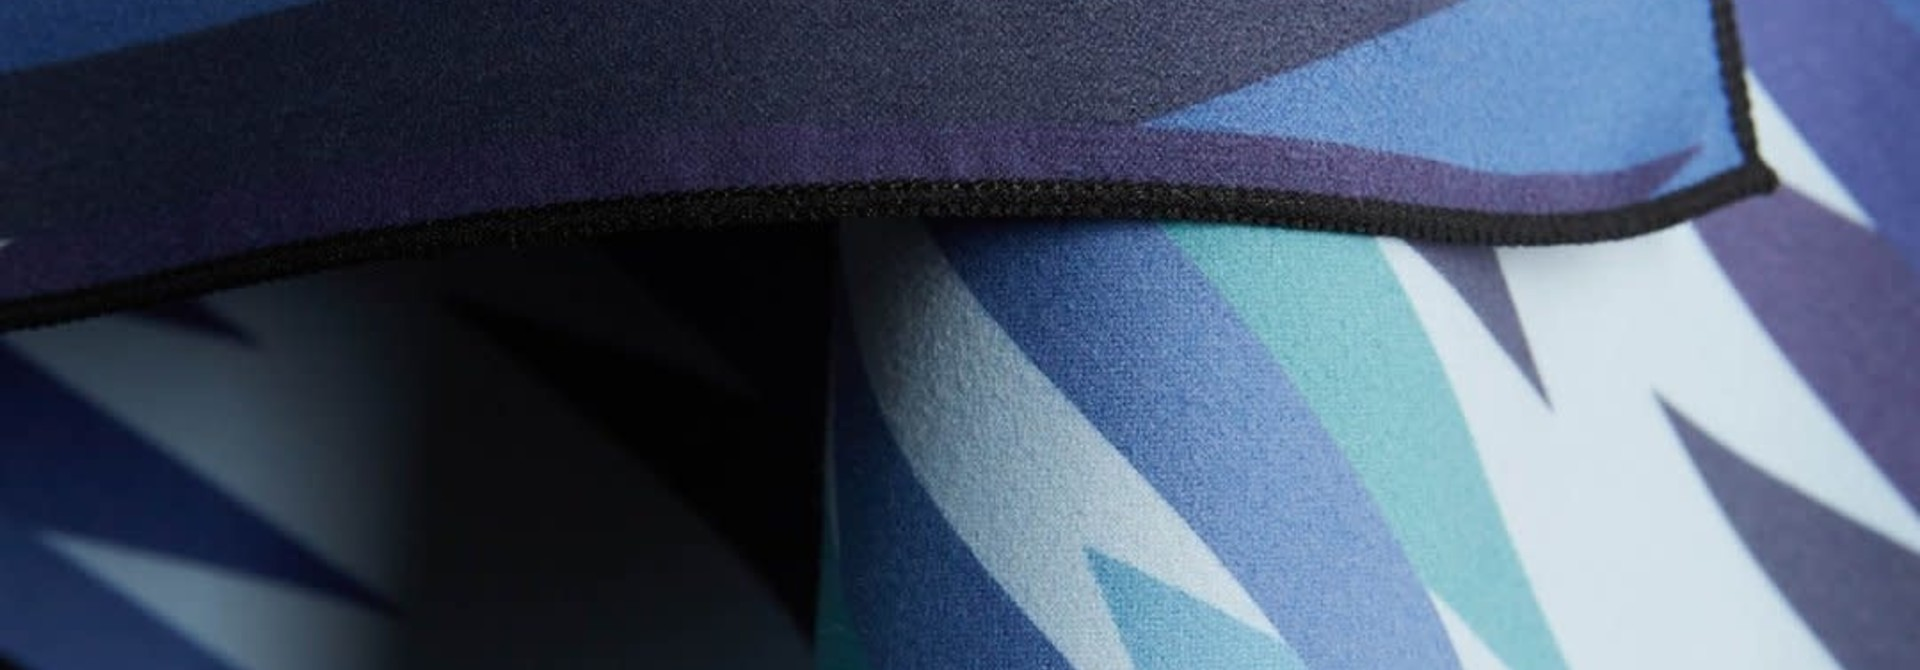 Nomadix Jackson Blue Ultralight Towel